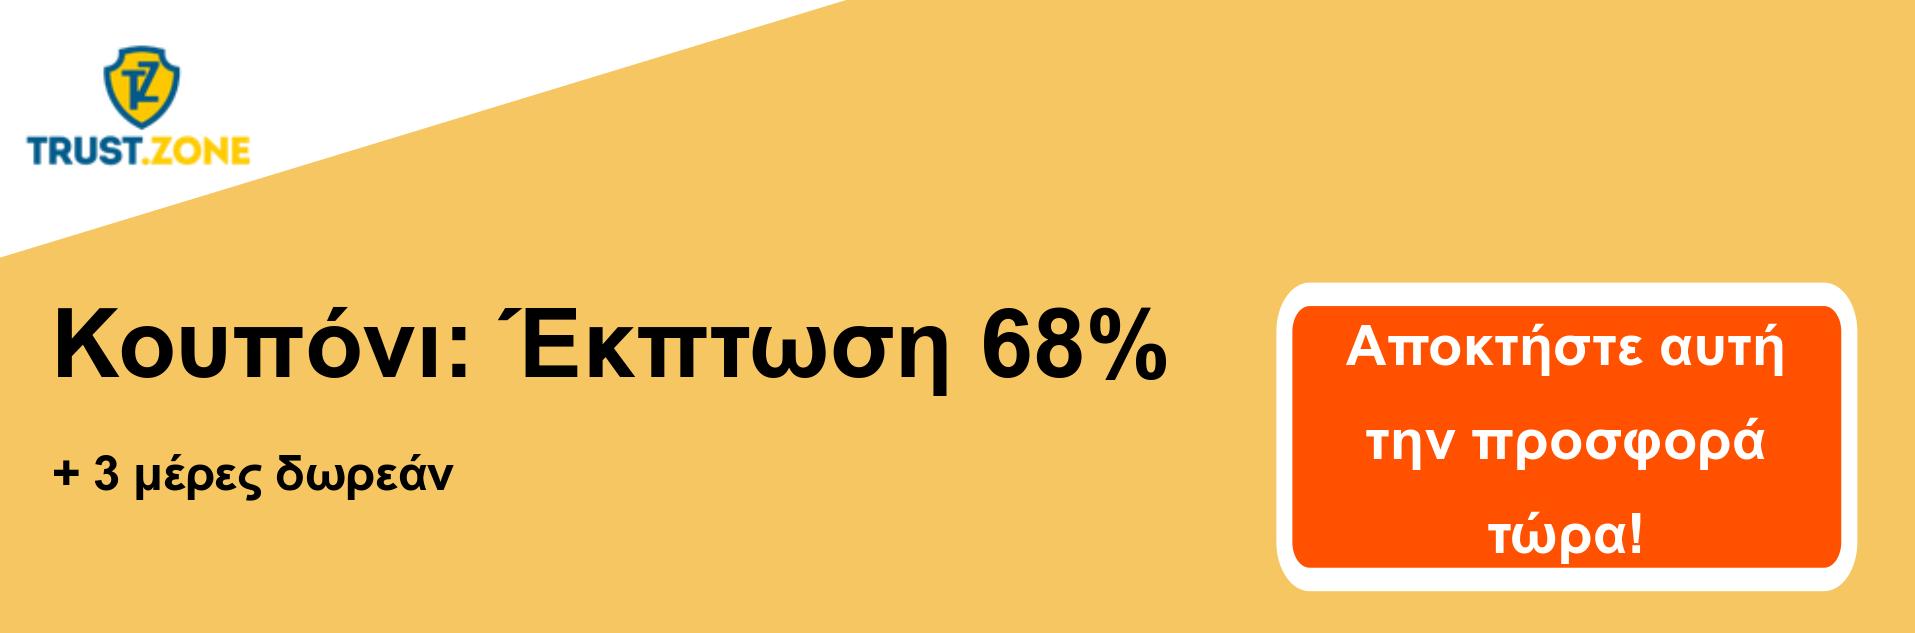 Trust.Zone VPN κουπόνι banner - έκπτωση 68%